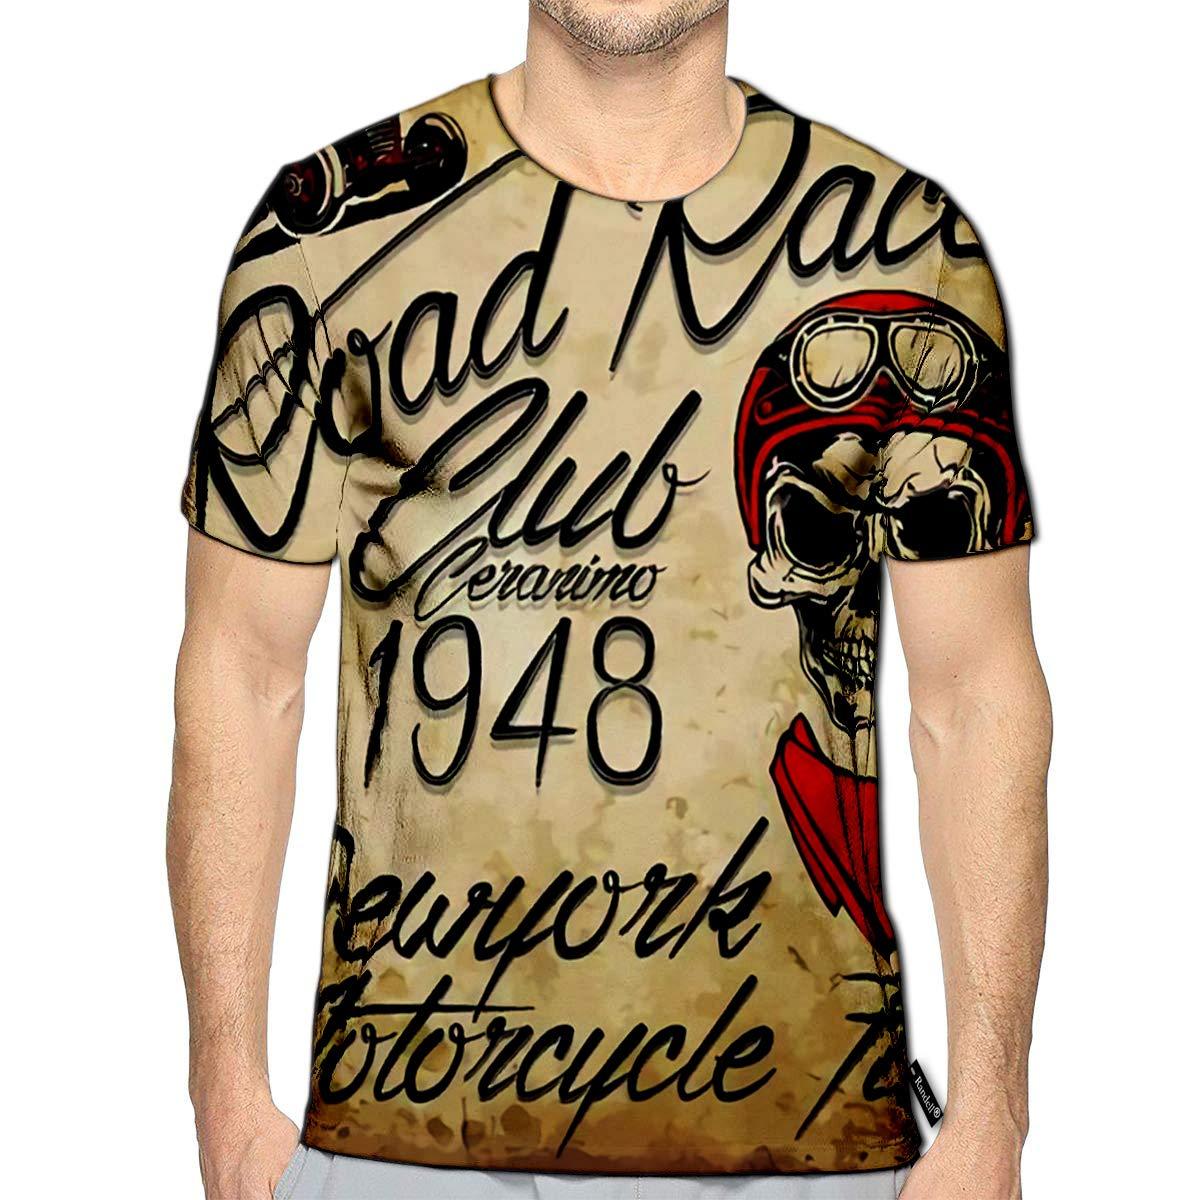 3D Printed T-Shirts Vintage Biker Skull Emblem Short Sleeve Tops Tees